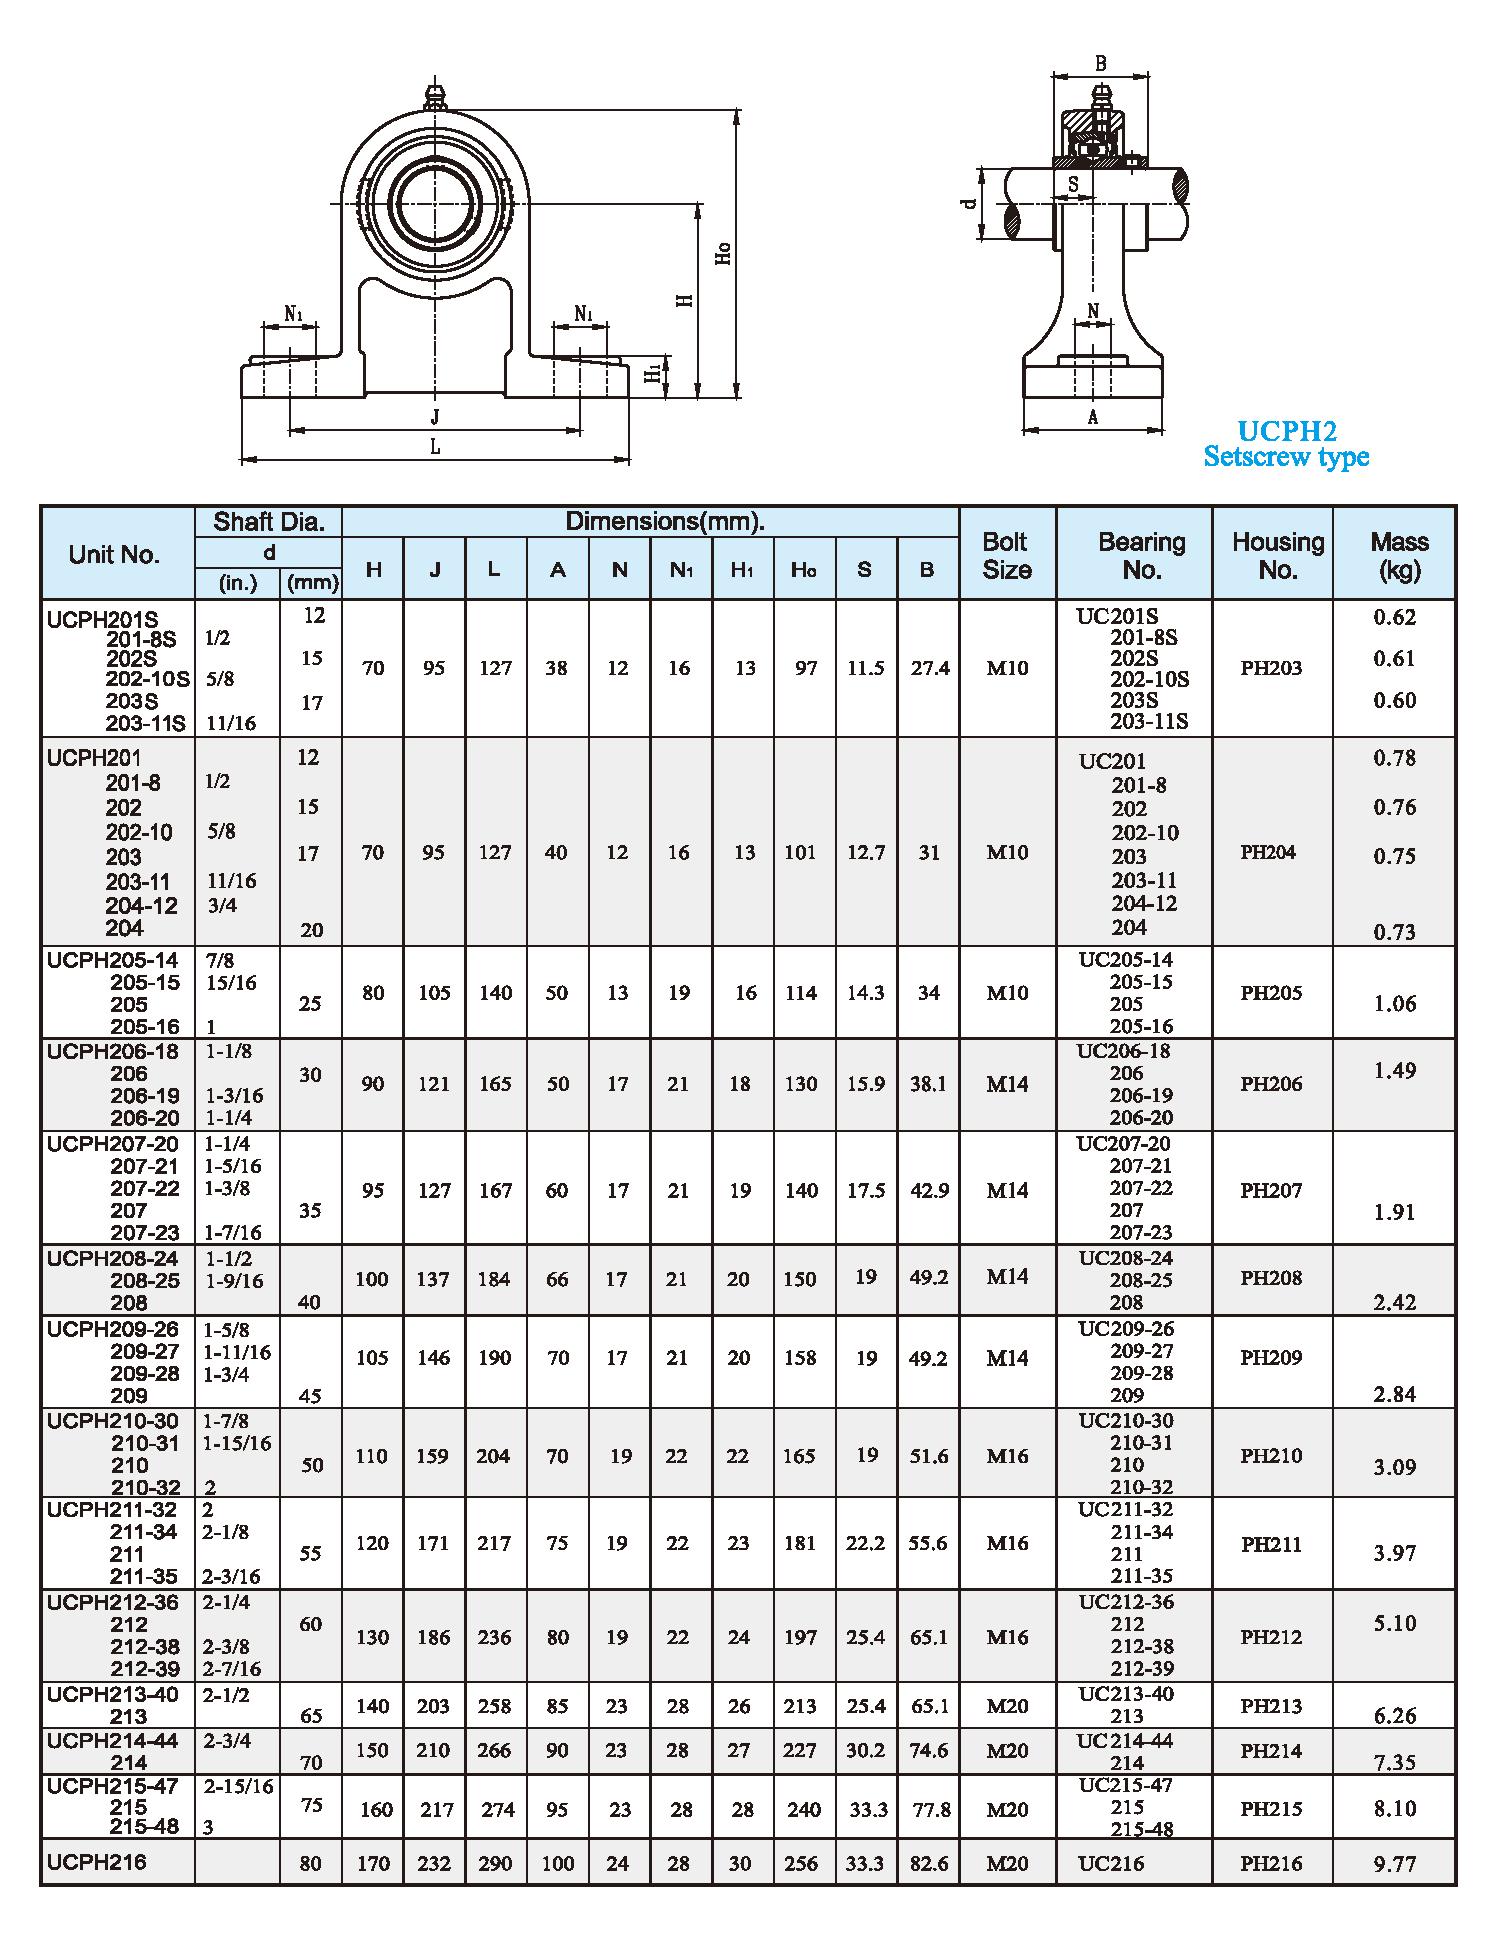 UCPH2 Setscrew type